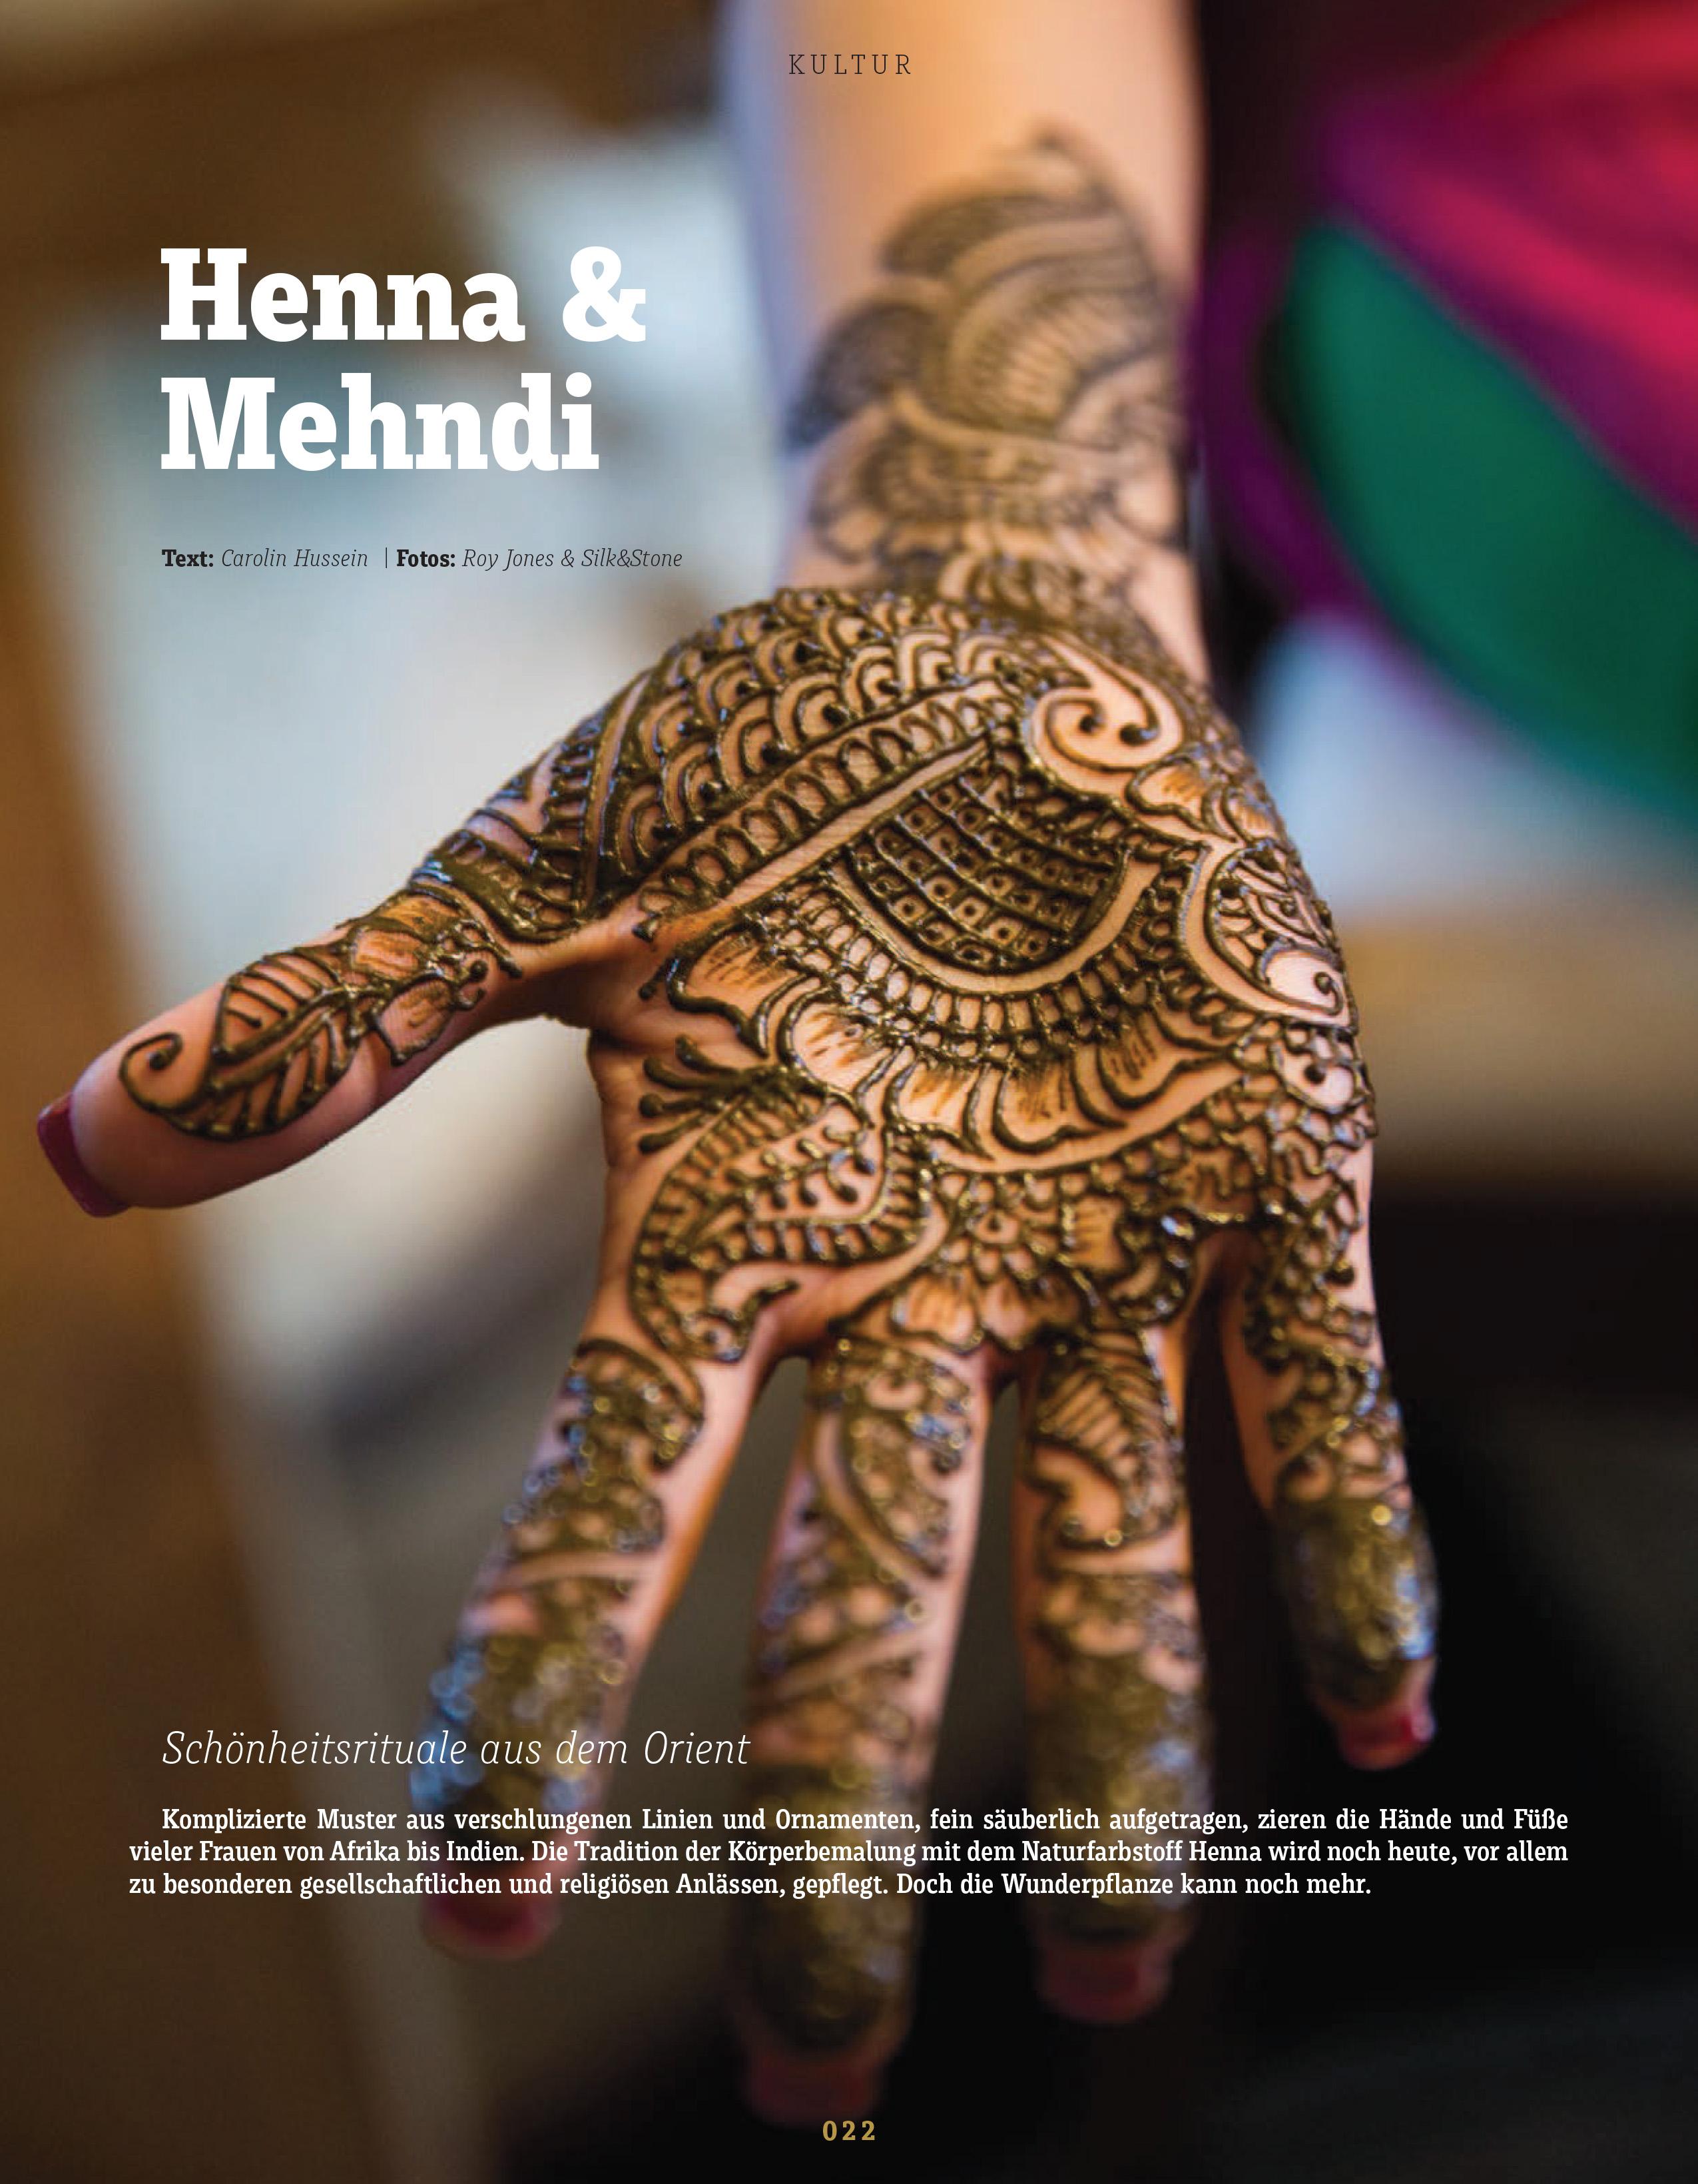 dme-0215-henna-2.jpg